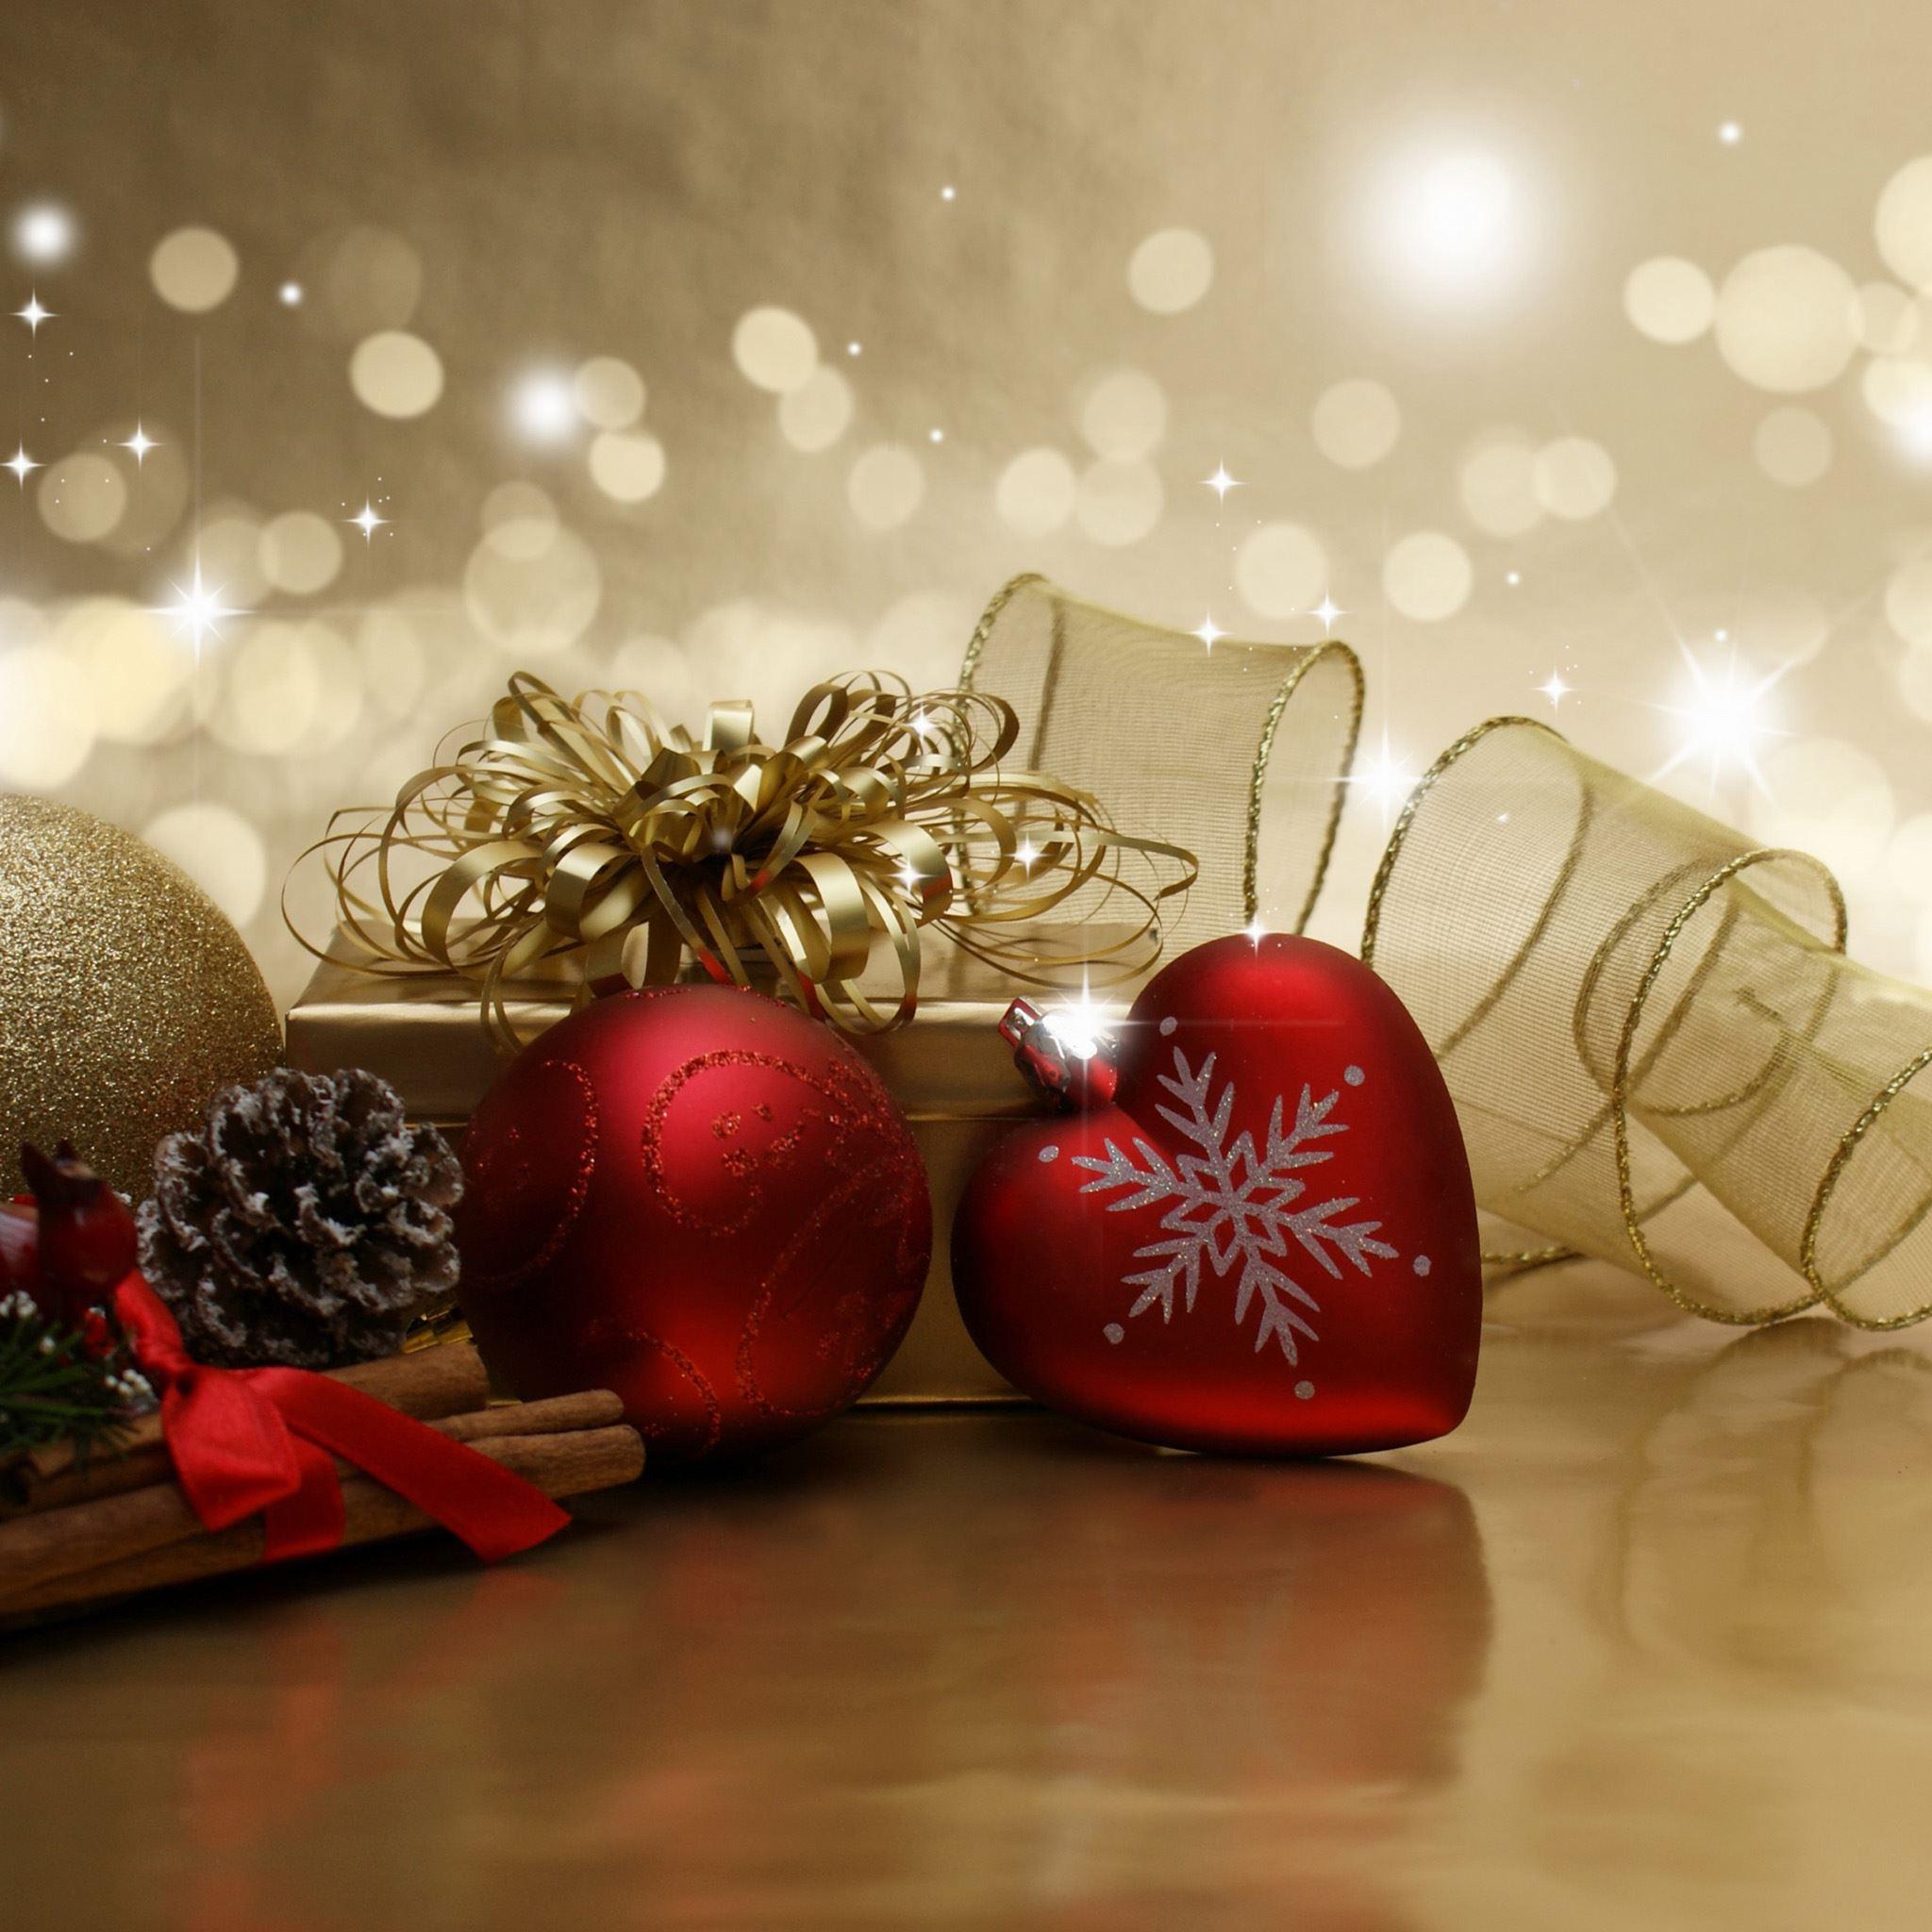 Christmas Love IPad Air Wallpaper Download